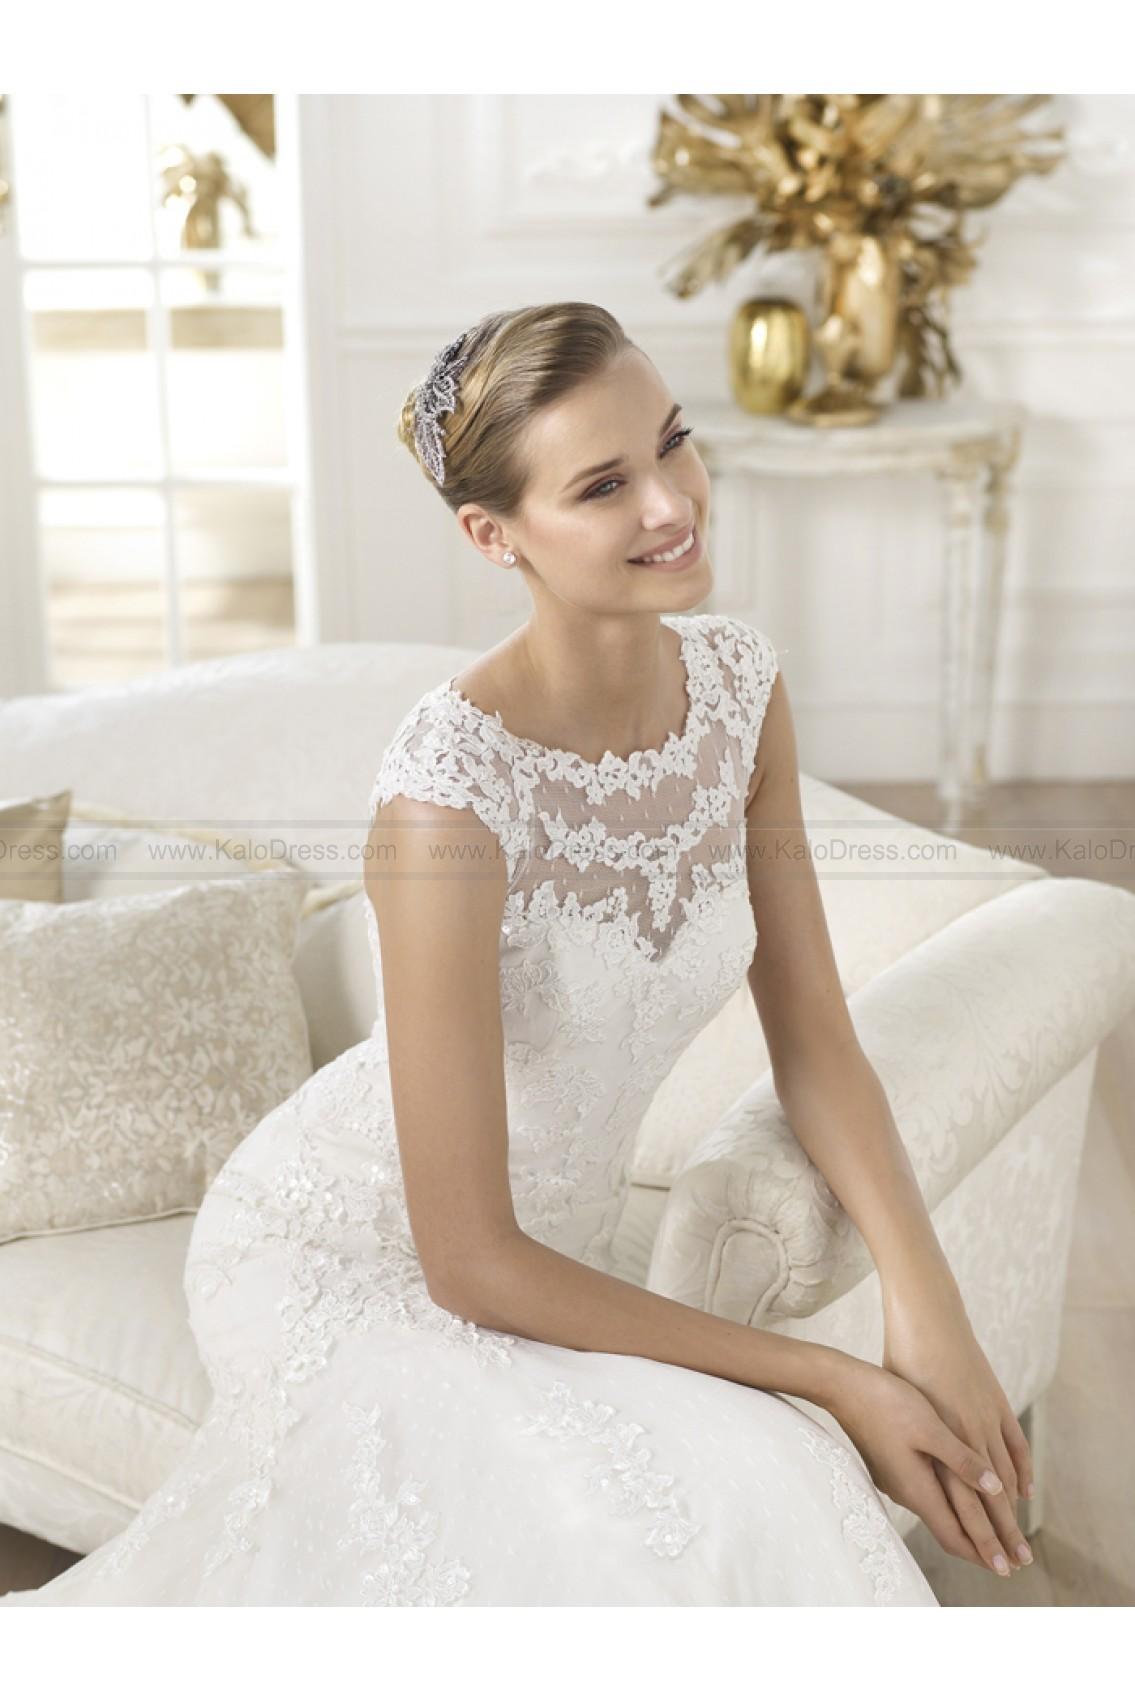 Pronovias Wedding Dresses - Style Landel - Wedding Dresses 2014 New - Formal Wedding Dresses